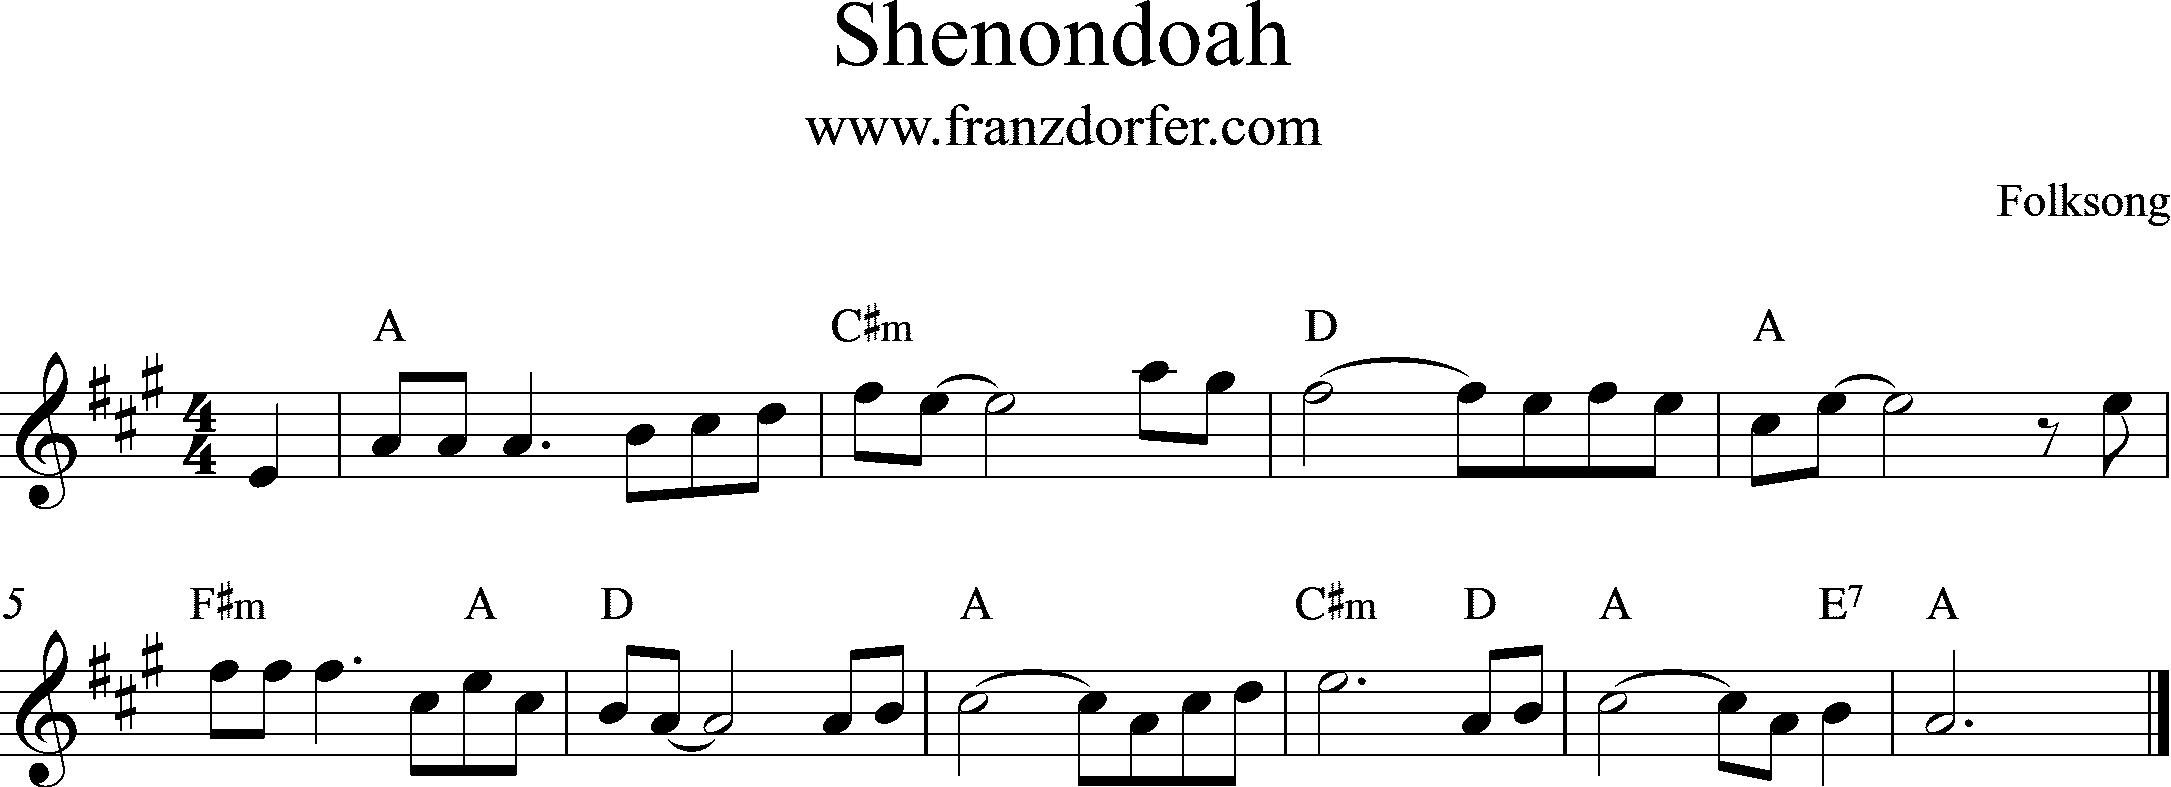 Shenondoah, A-Major